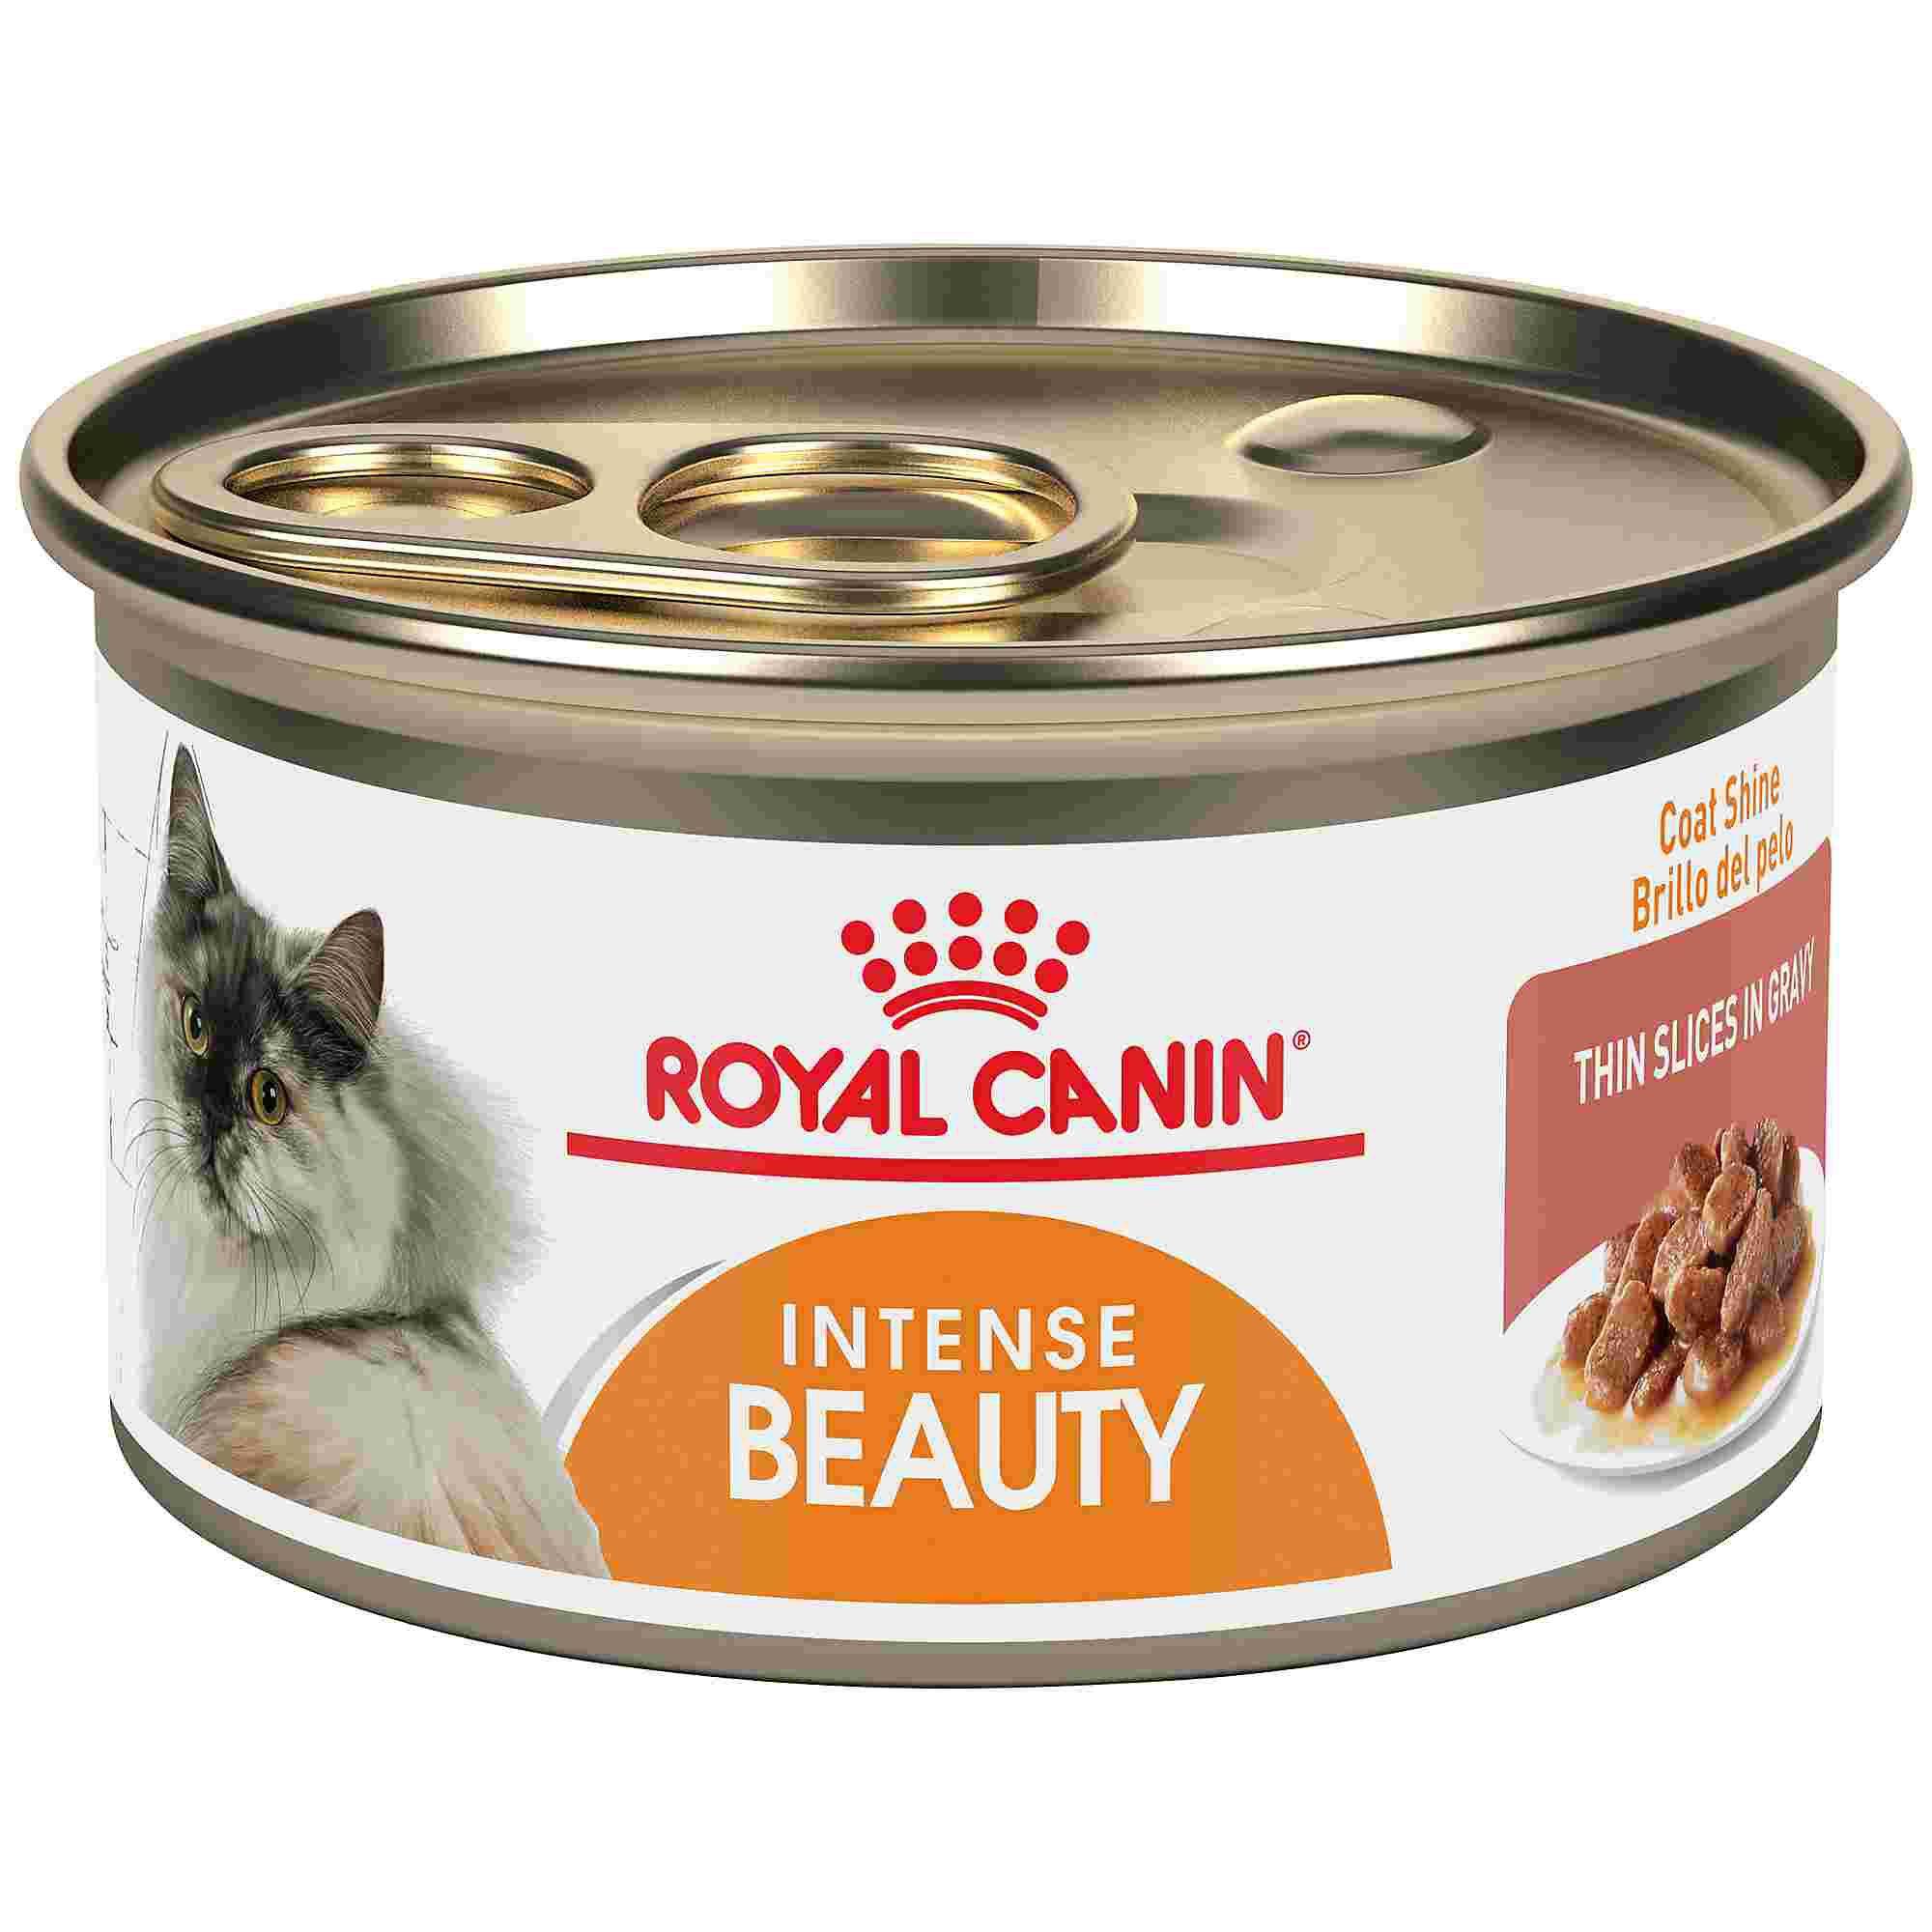 Royal Canin Feline Health Nutrition Intense Beauty Canned Cat Food